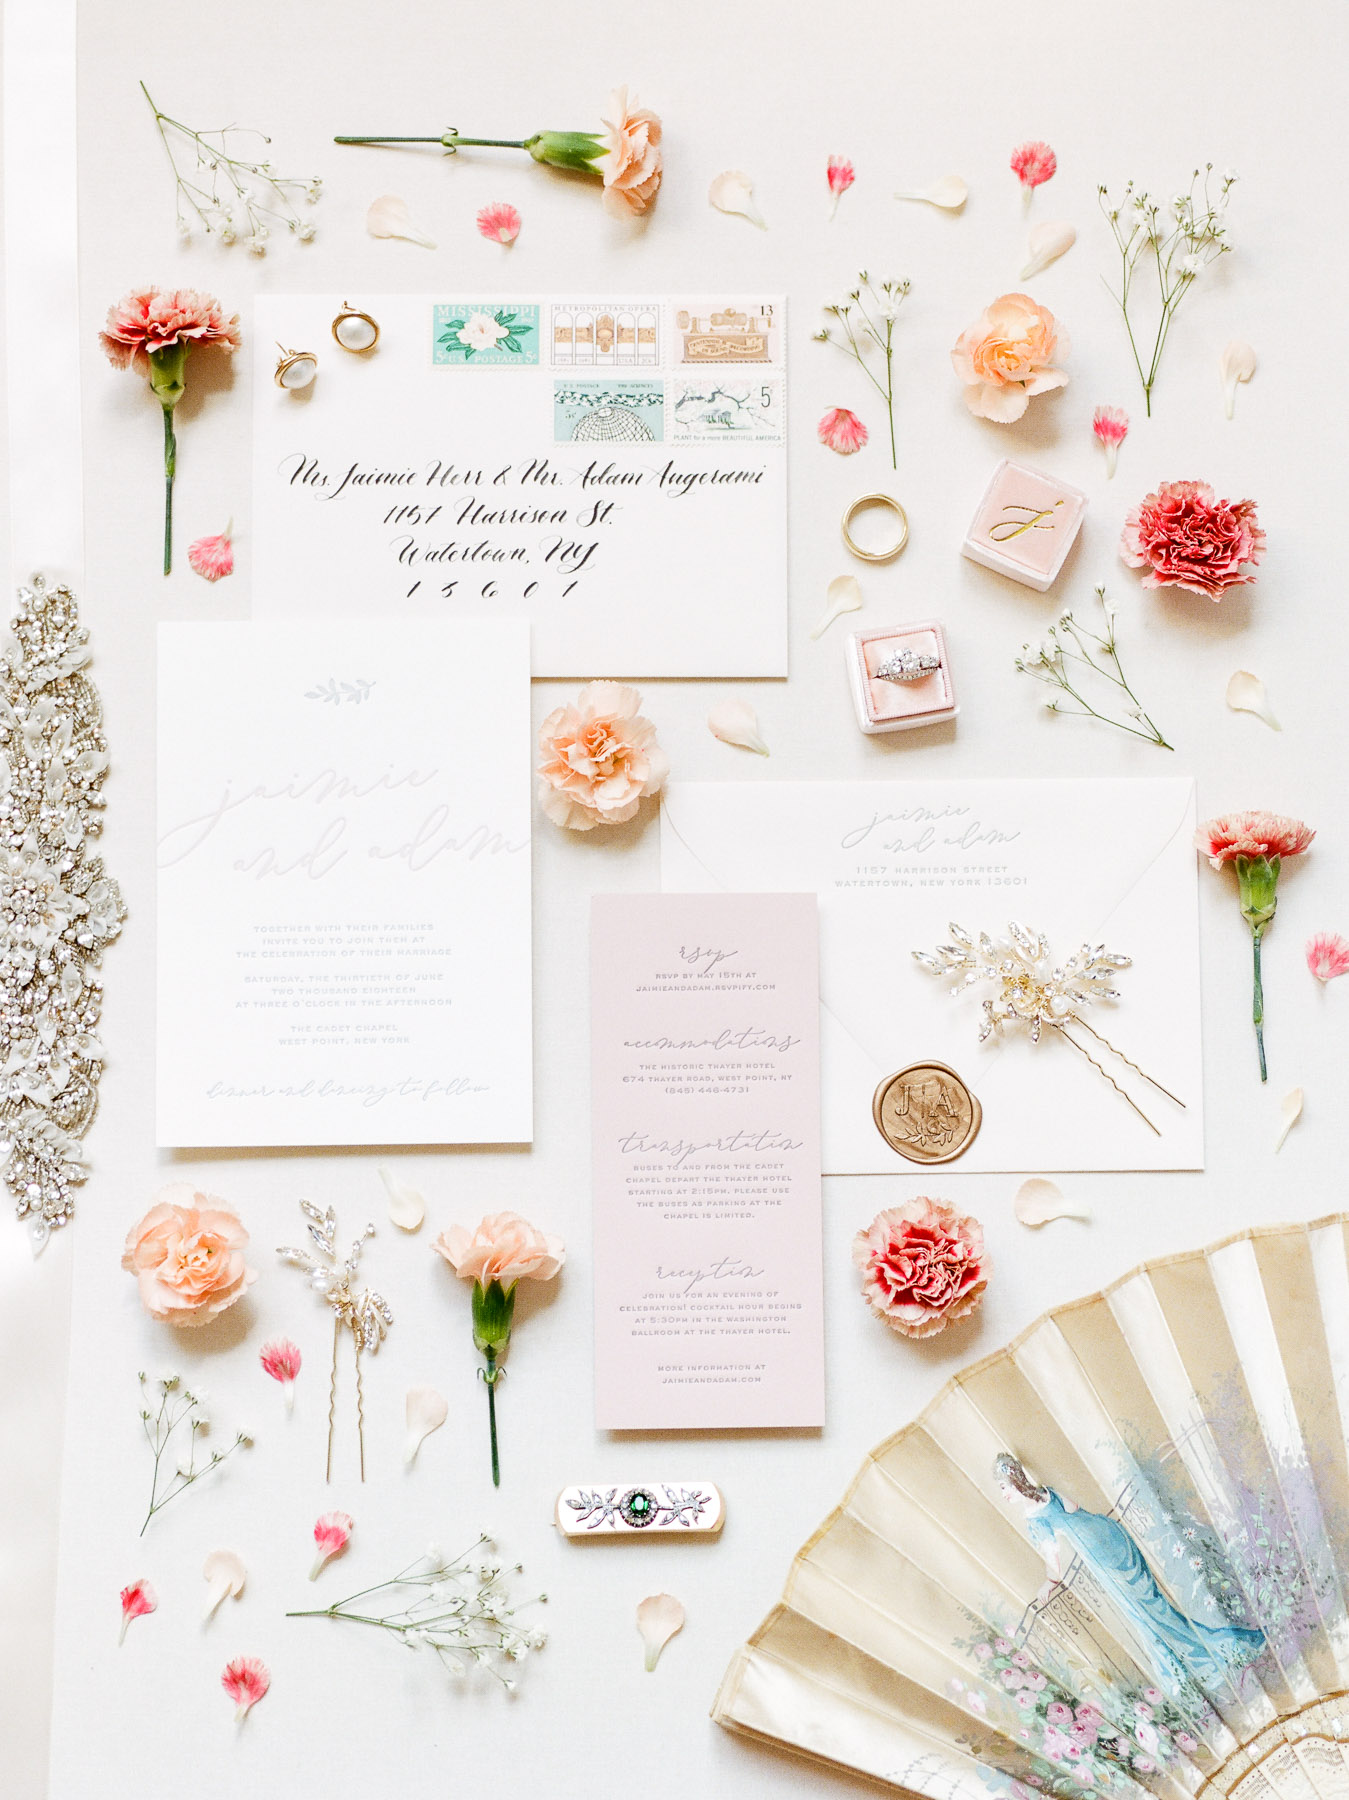 Invitation Flat Lay Wedding Details